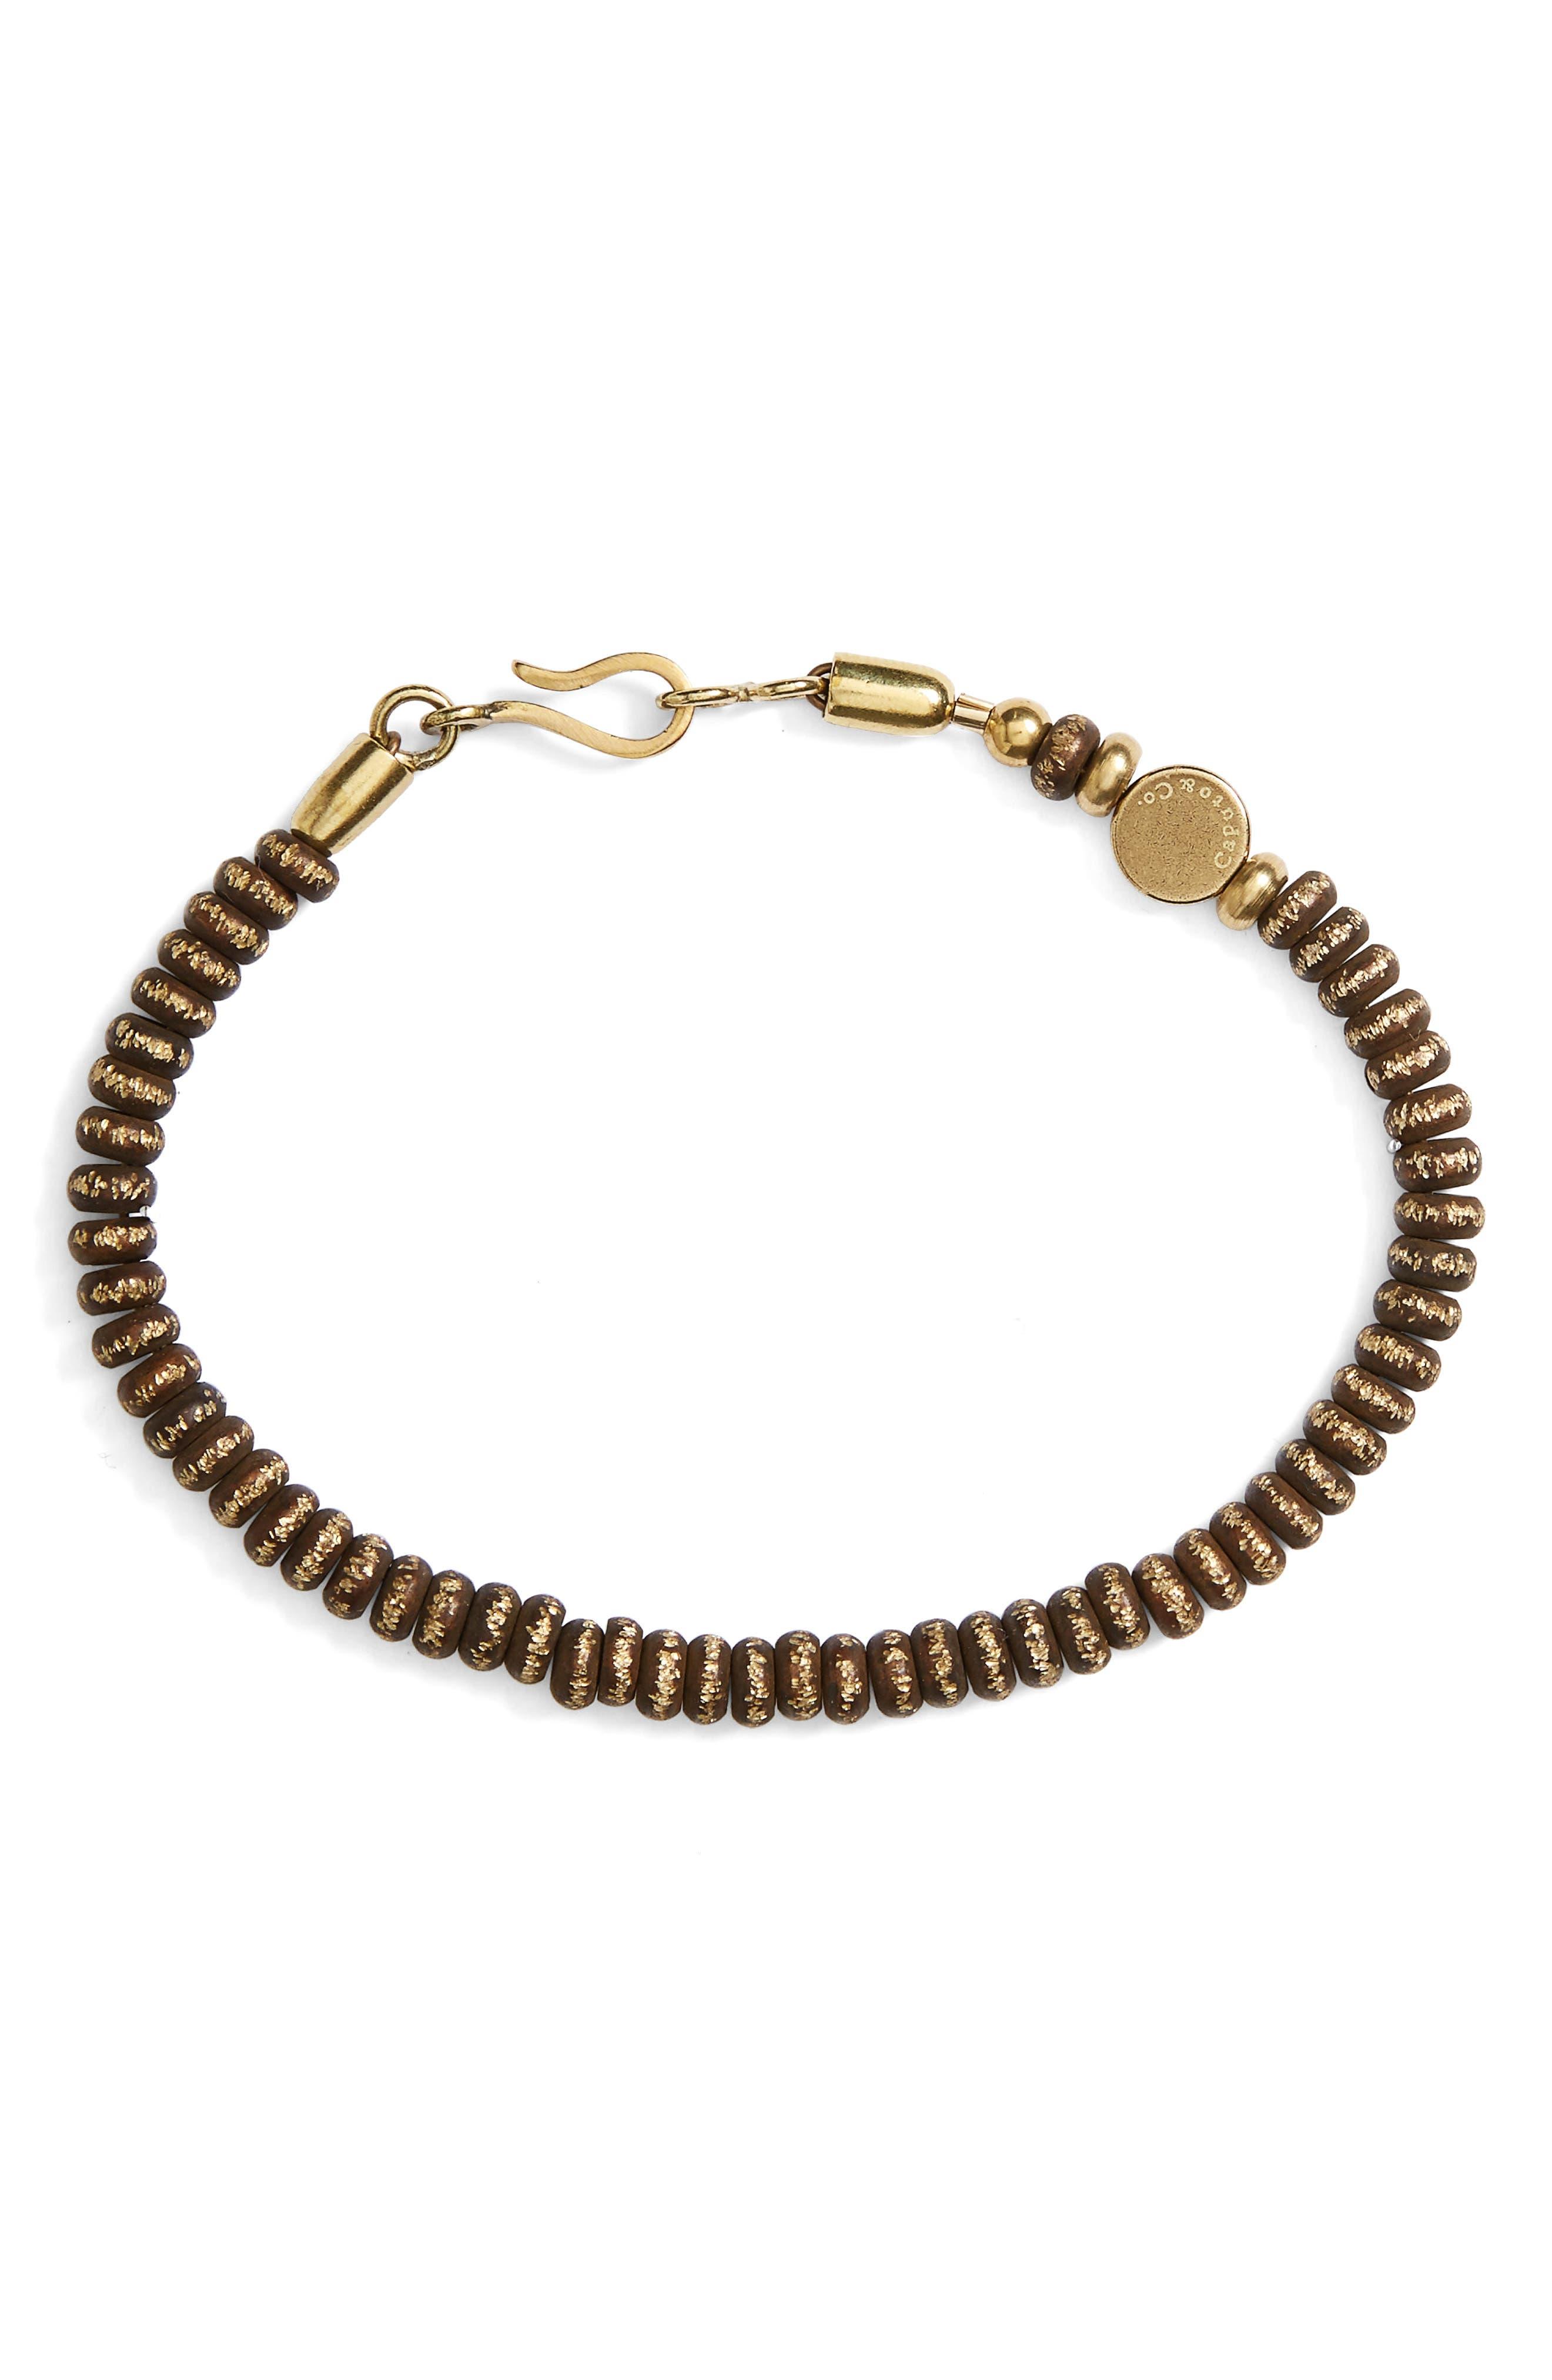 Main Image - Caputo & Co. Rondelle Brass Bead Bracelet